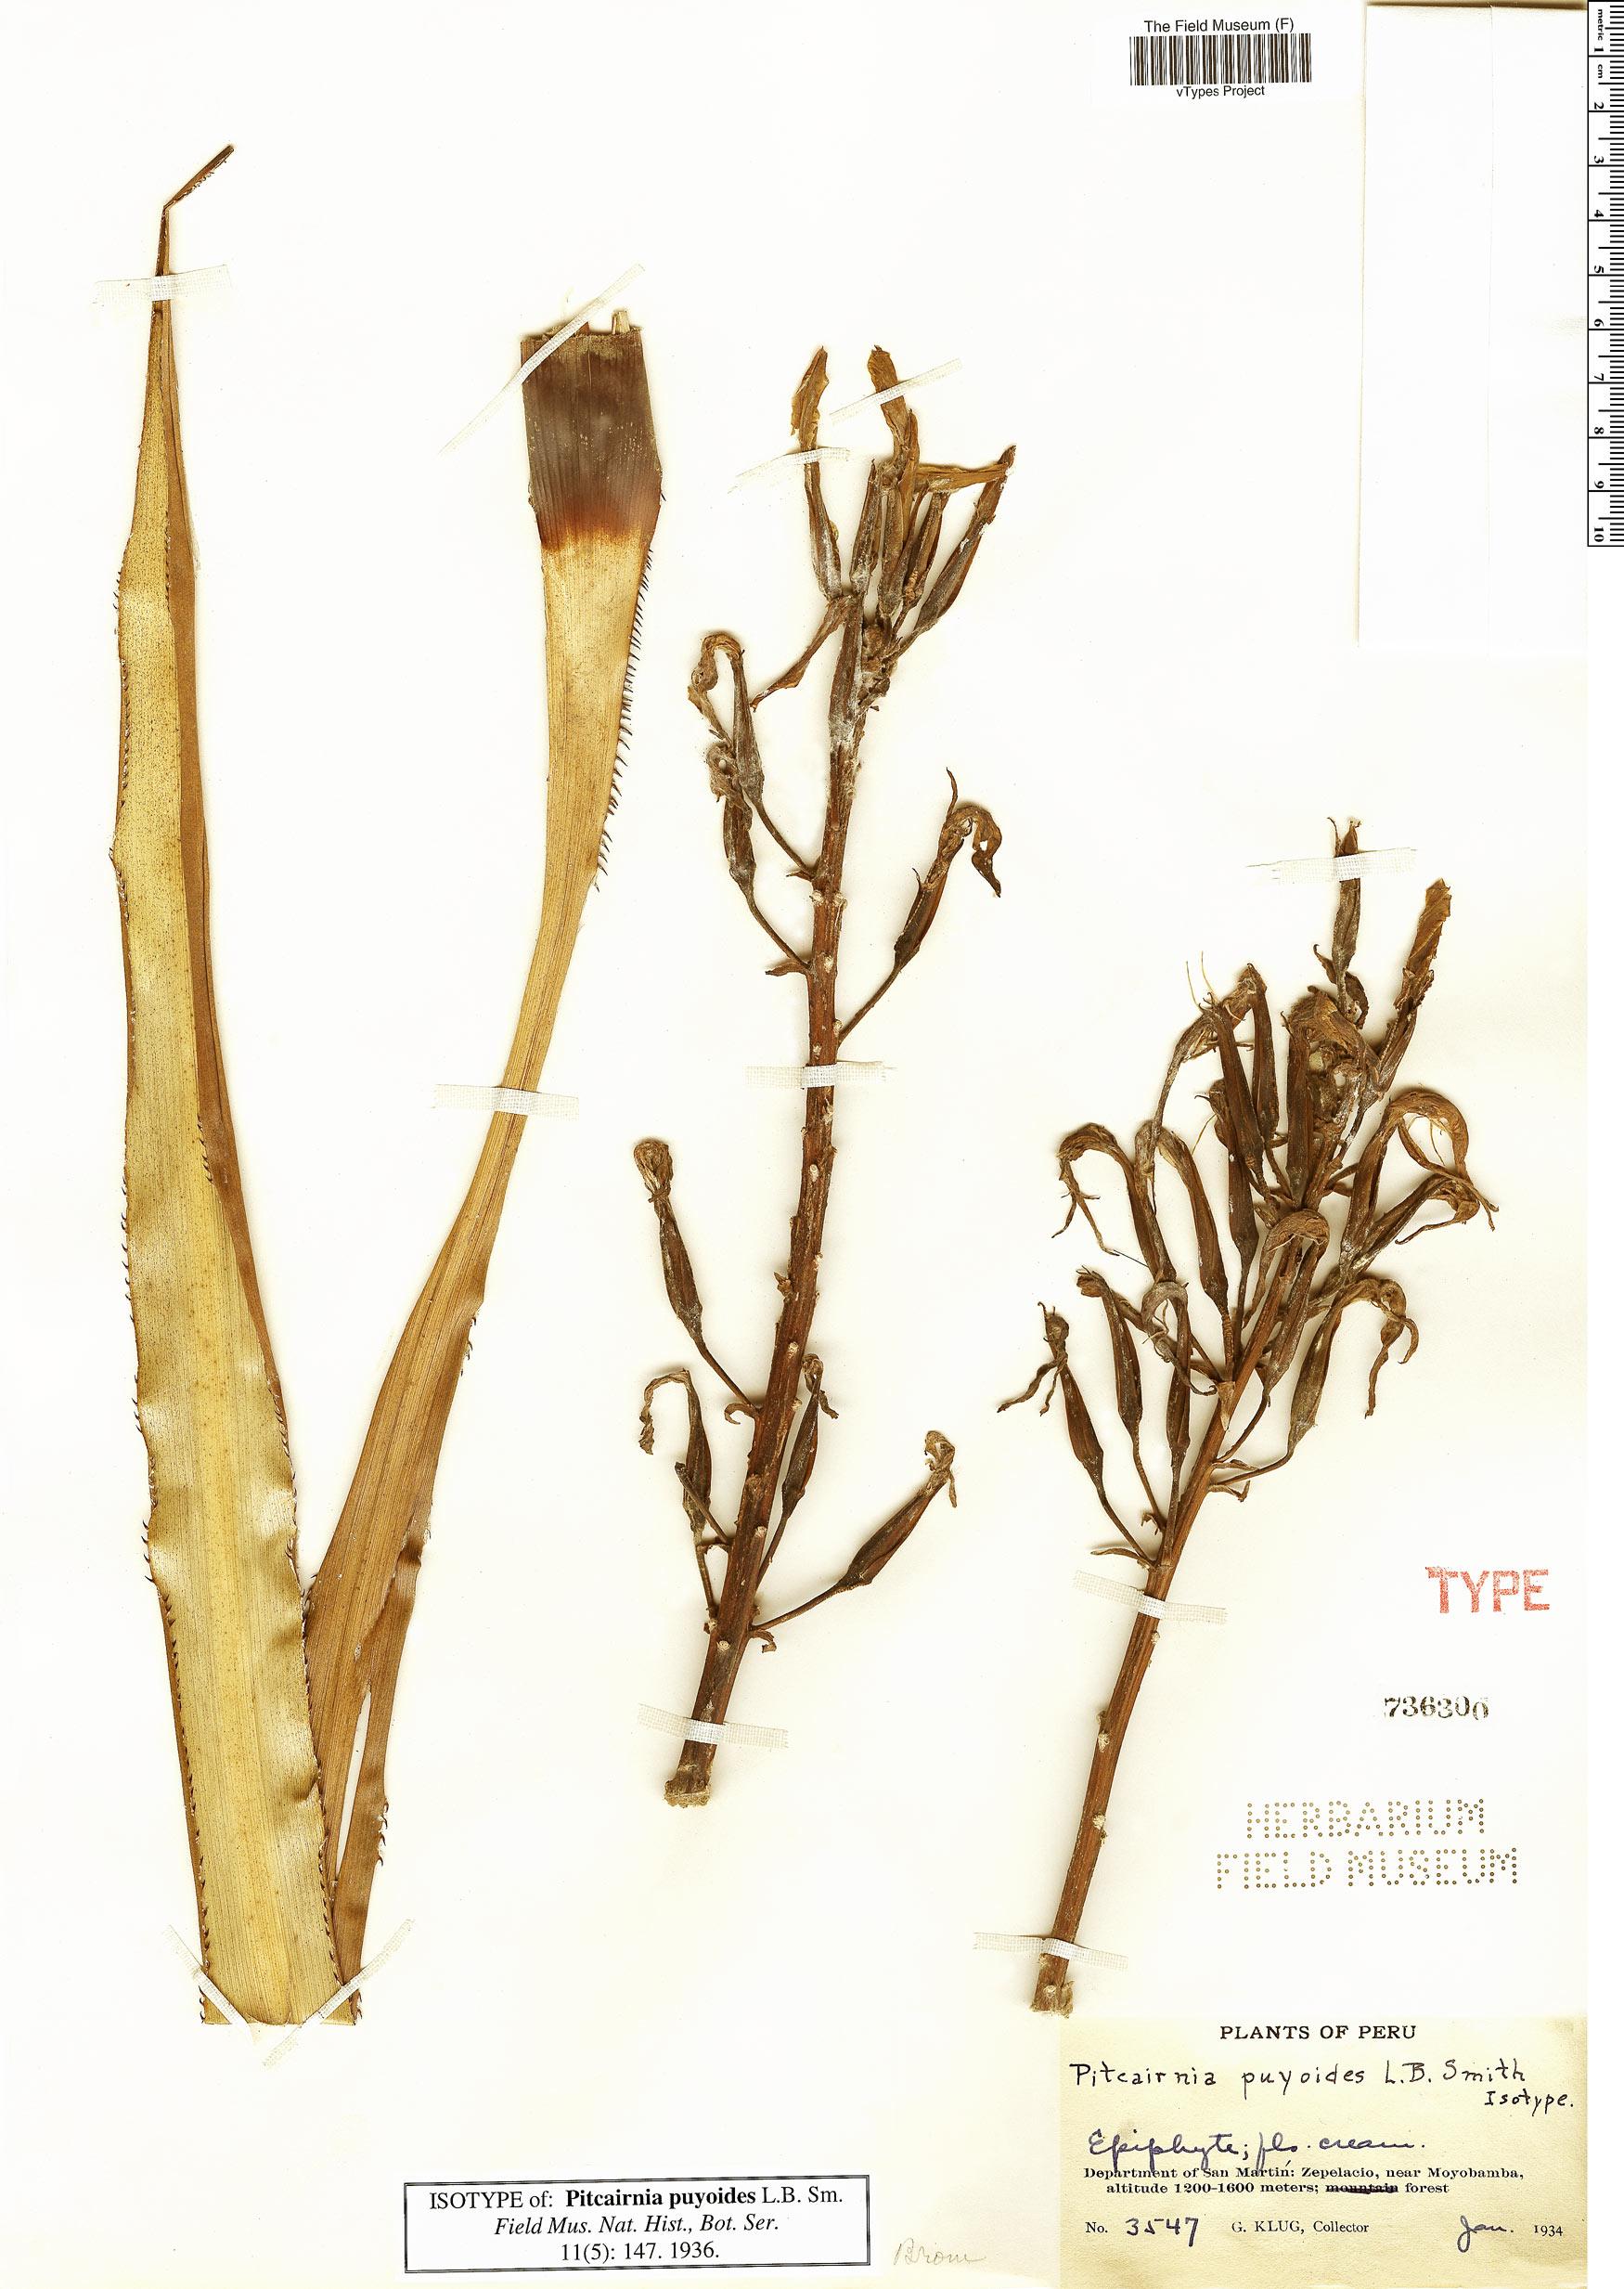 Specimen: Pitcairnia puyoides